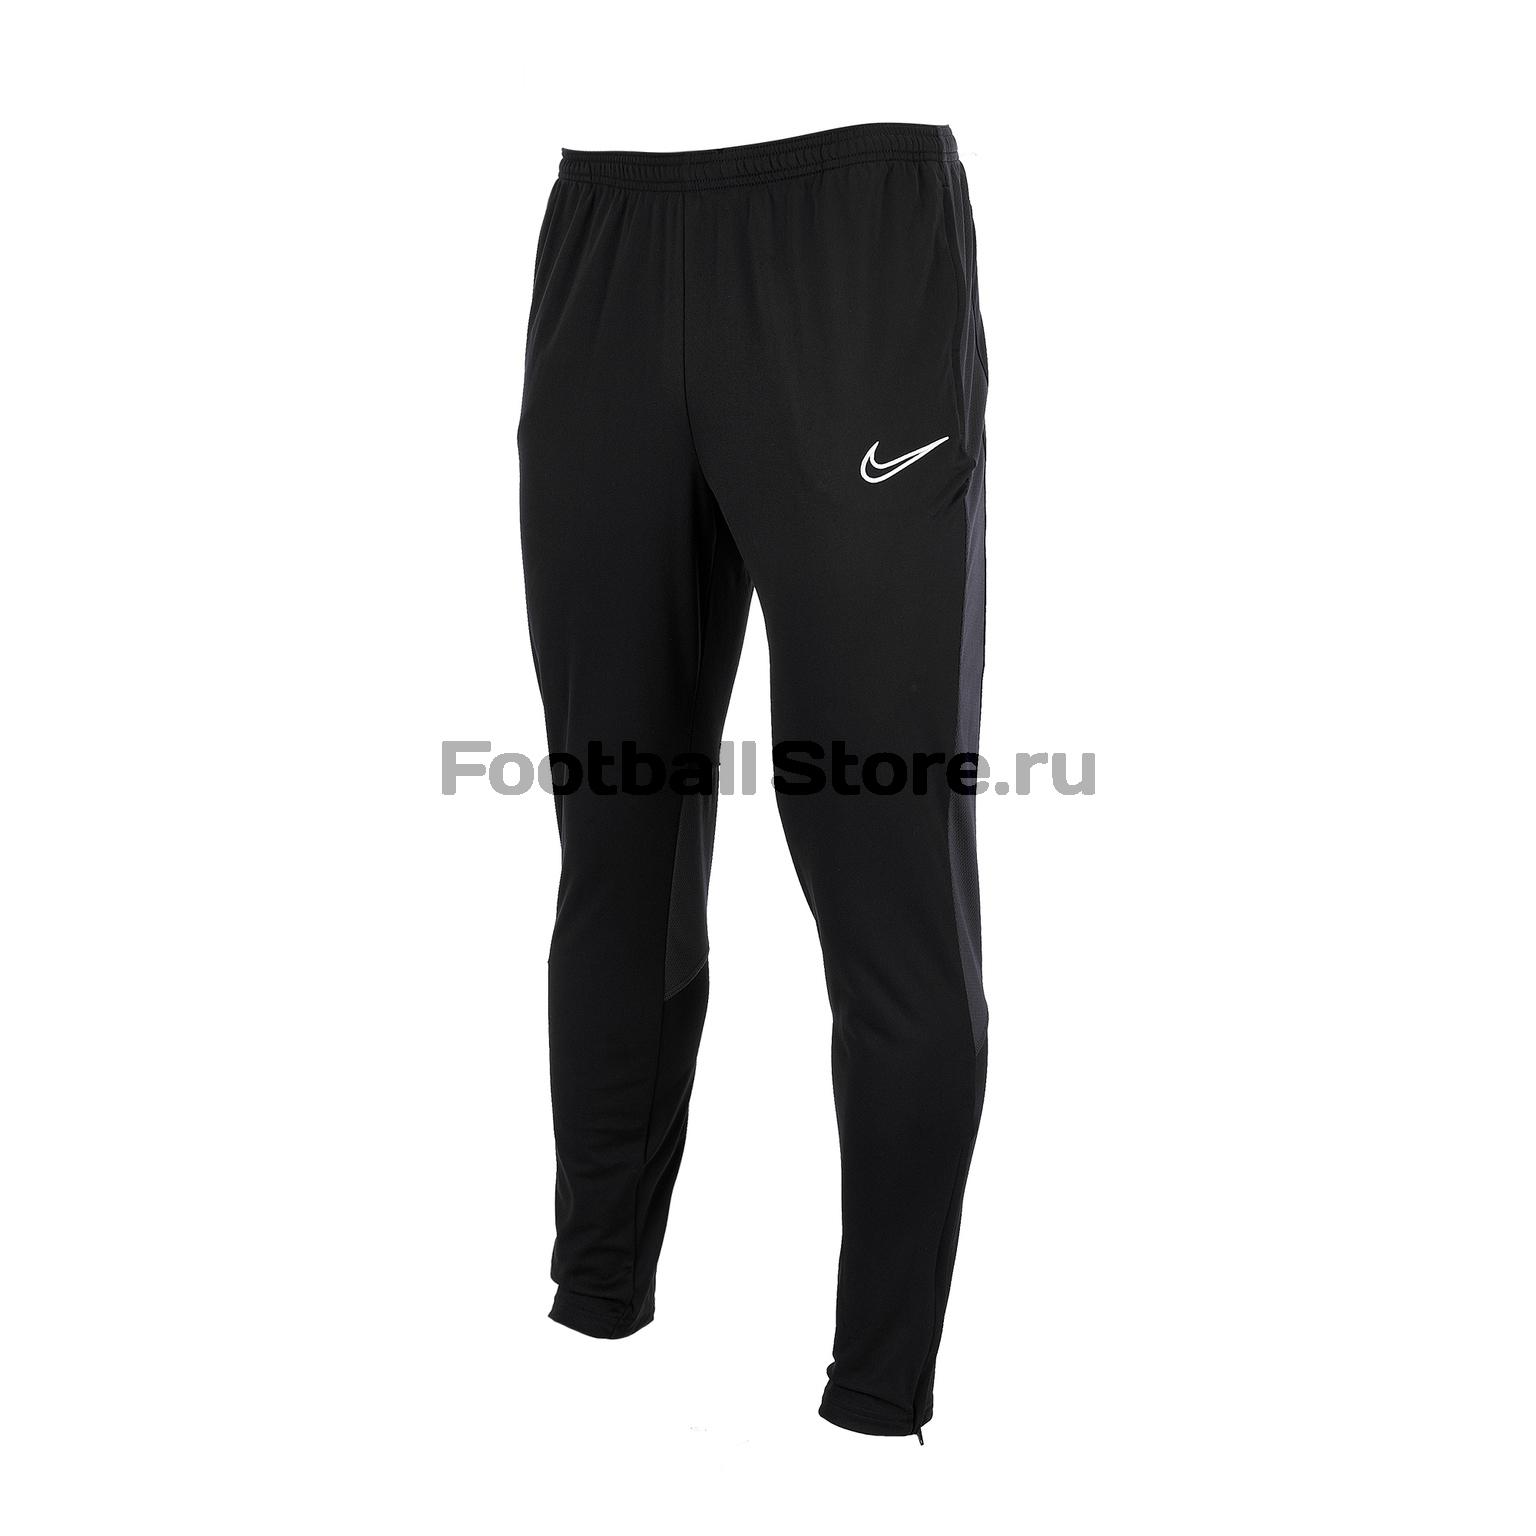 1e4dbe99 Брюки тренировочные Nike Dry Academy Pant SMR AQ3717-010